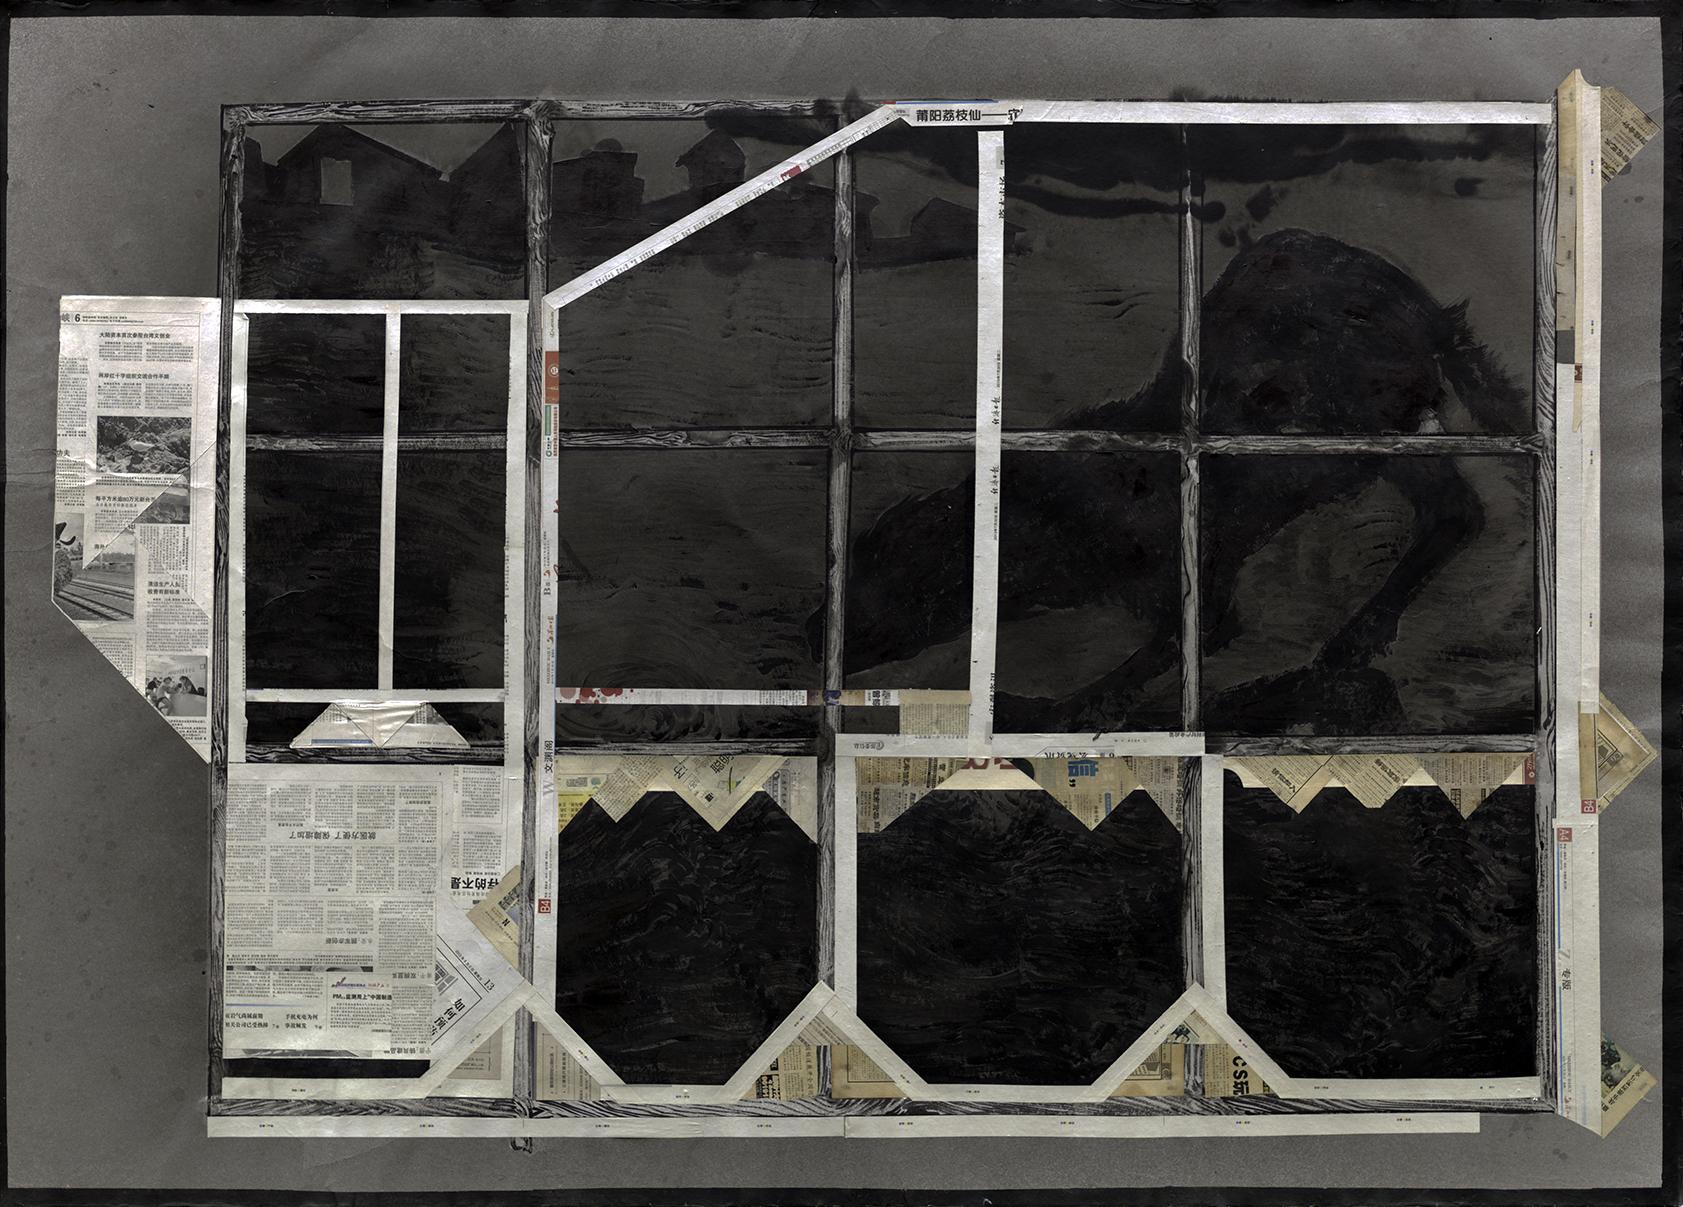 Chen Yujun 陈彧君, Temporary Building No.130808 临时建筑No.130808, 2013, Handmade paper, newspaper, ink and acrylic 手工纸,水墨,丙烯,报纸, 200 x 150 cm